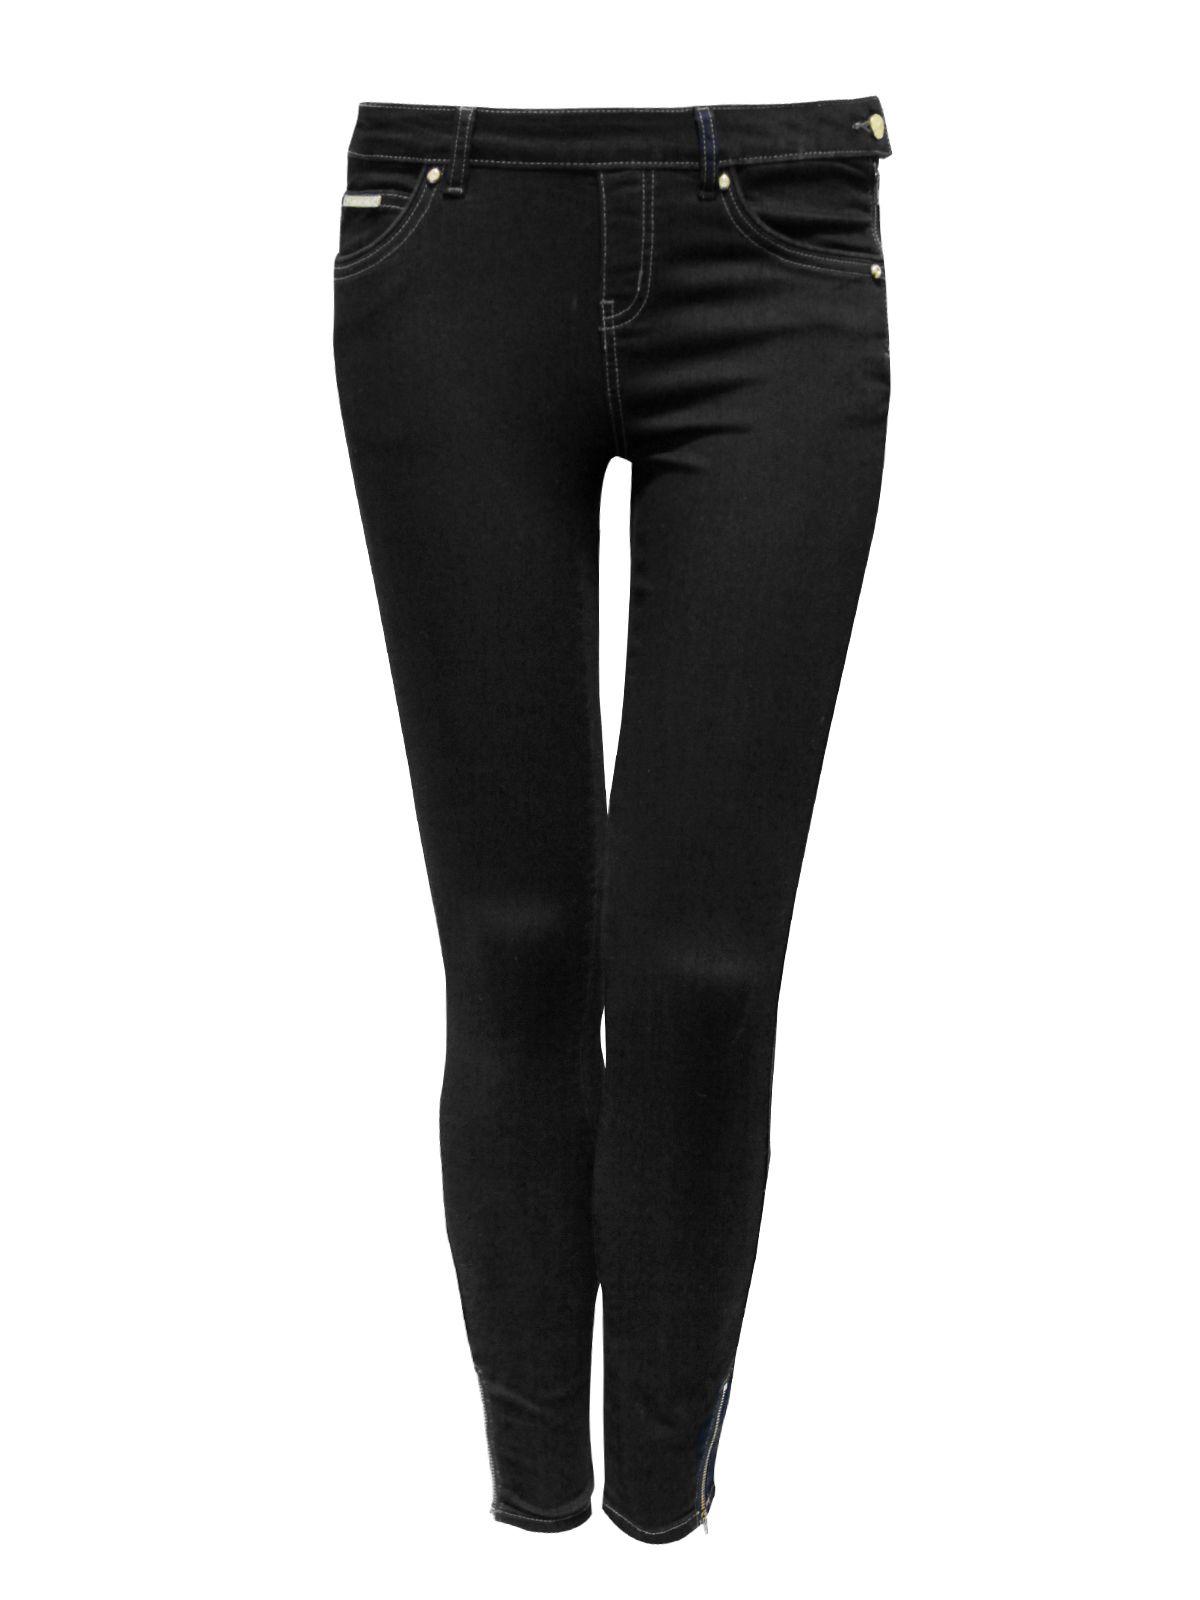 Jane norman Side Zip Jeggings in Black